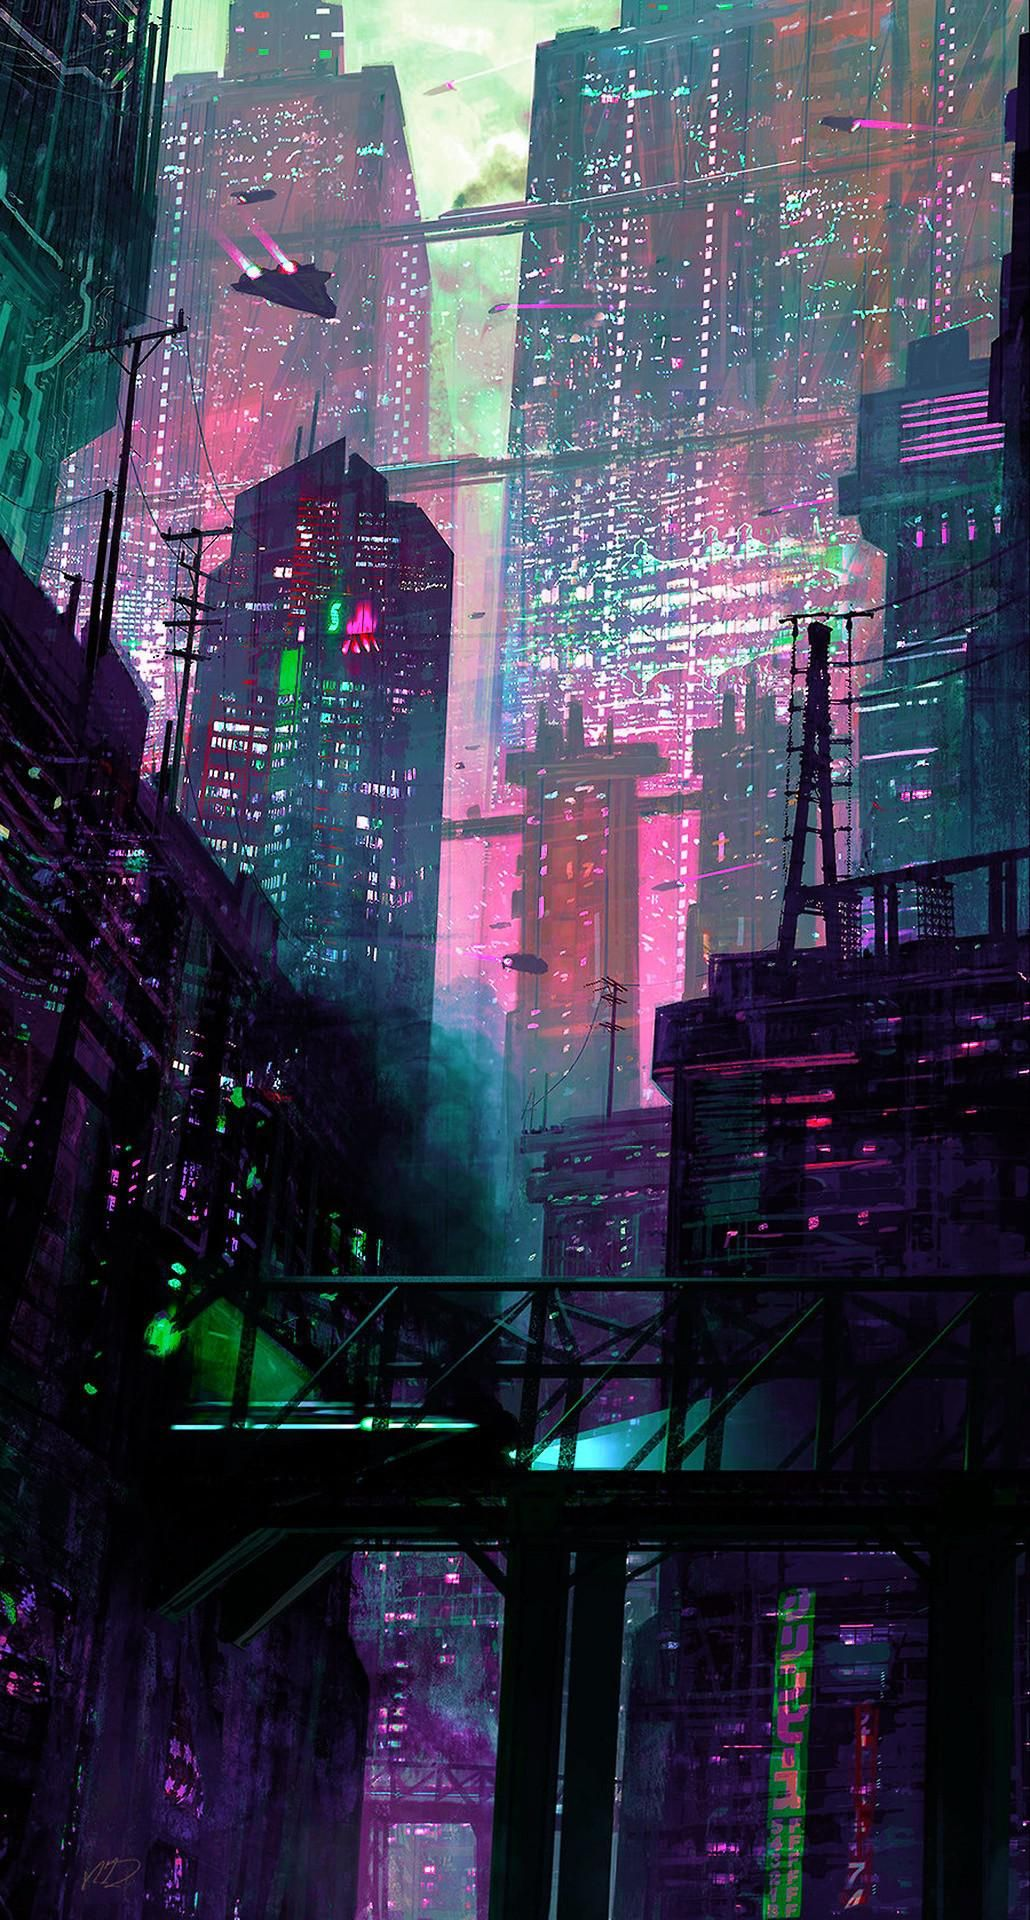 Unknown author 1 #cyberpunk2077 #cyberpunk2077conceptart #cyberpunk2077wallpapers #cyberpunk2077artworks #cyberpunk2077trailer #cyberpunk2077wallapaper #cyberpunk2077game #cyberpunk2077videogame